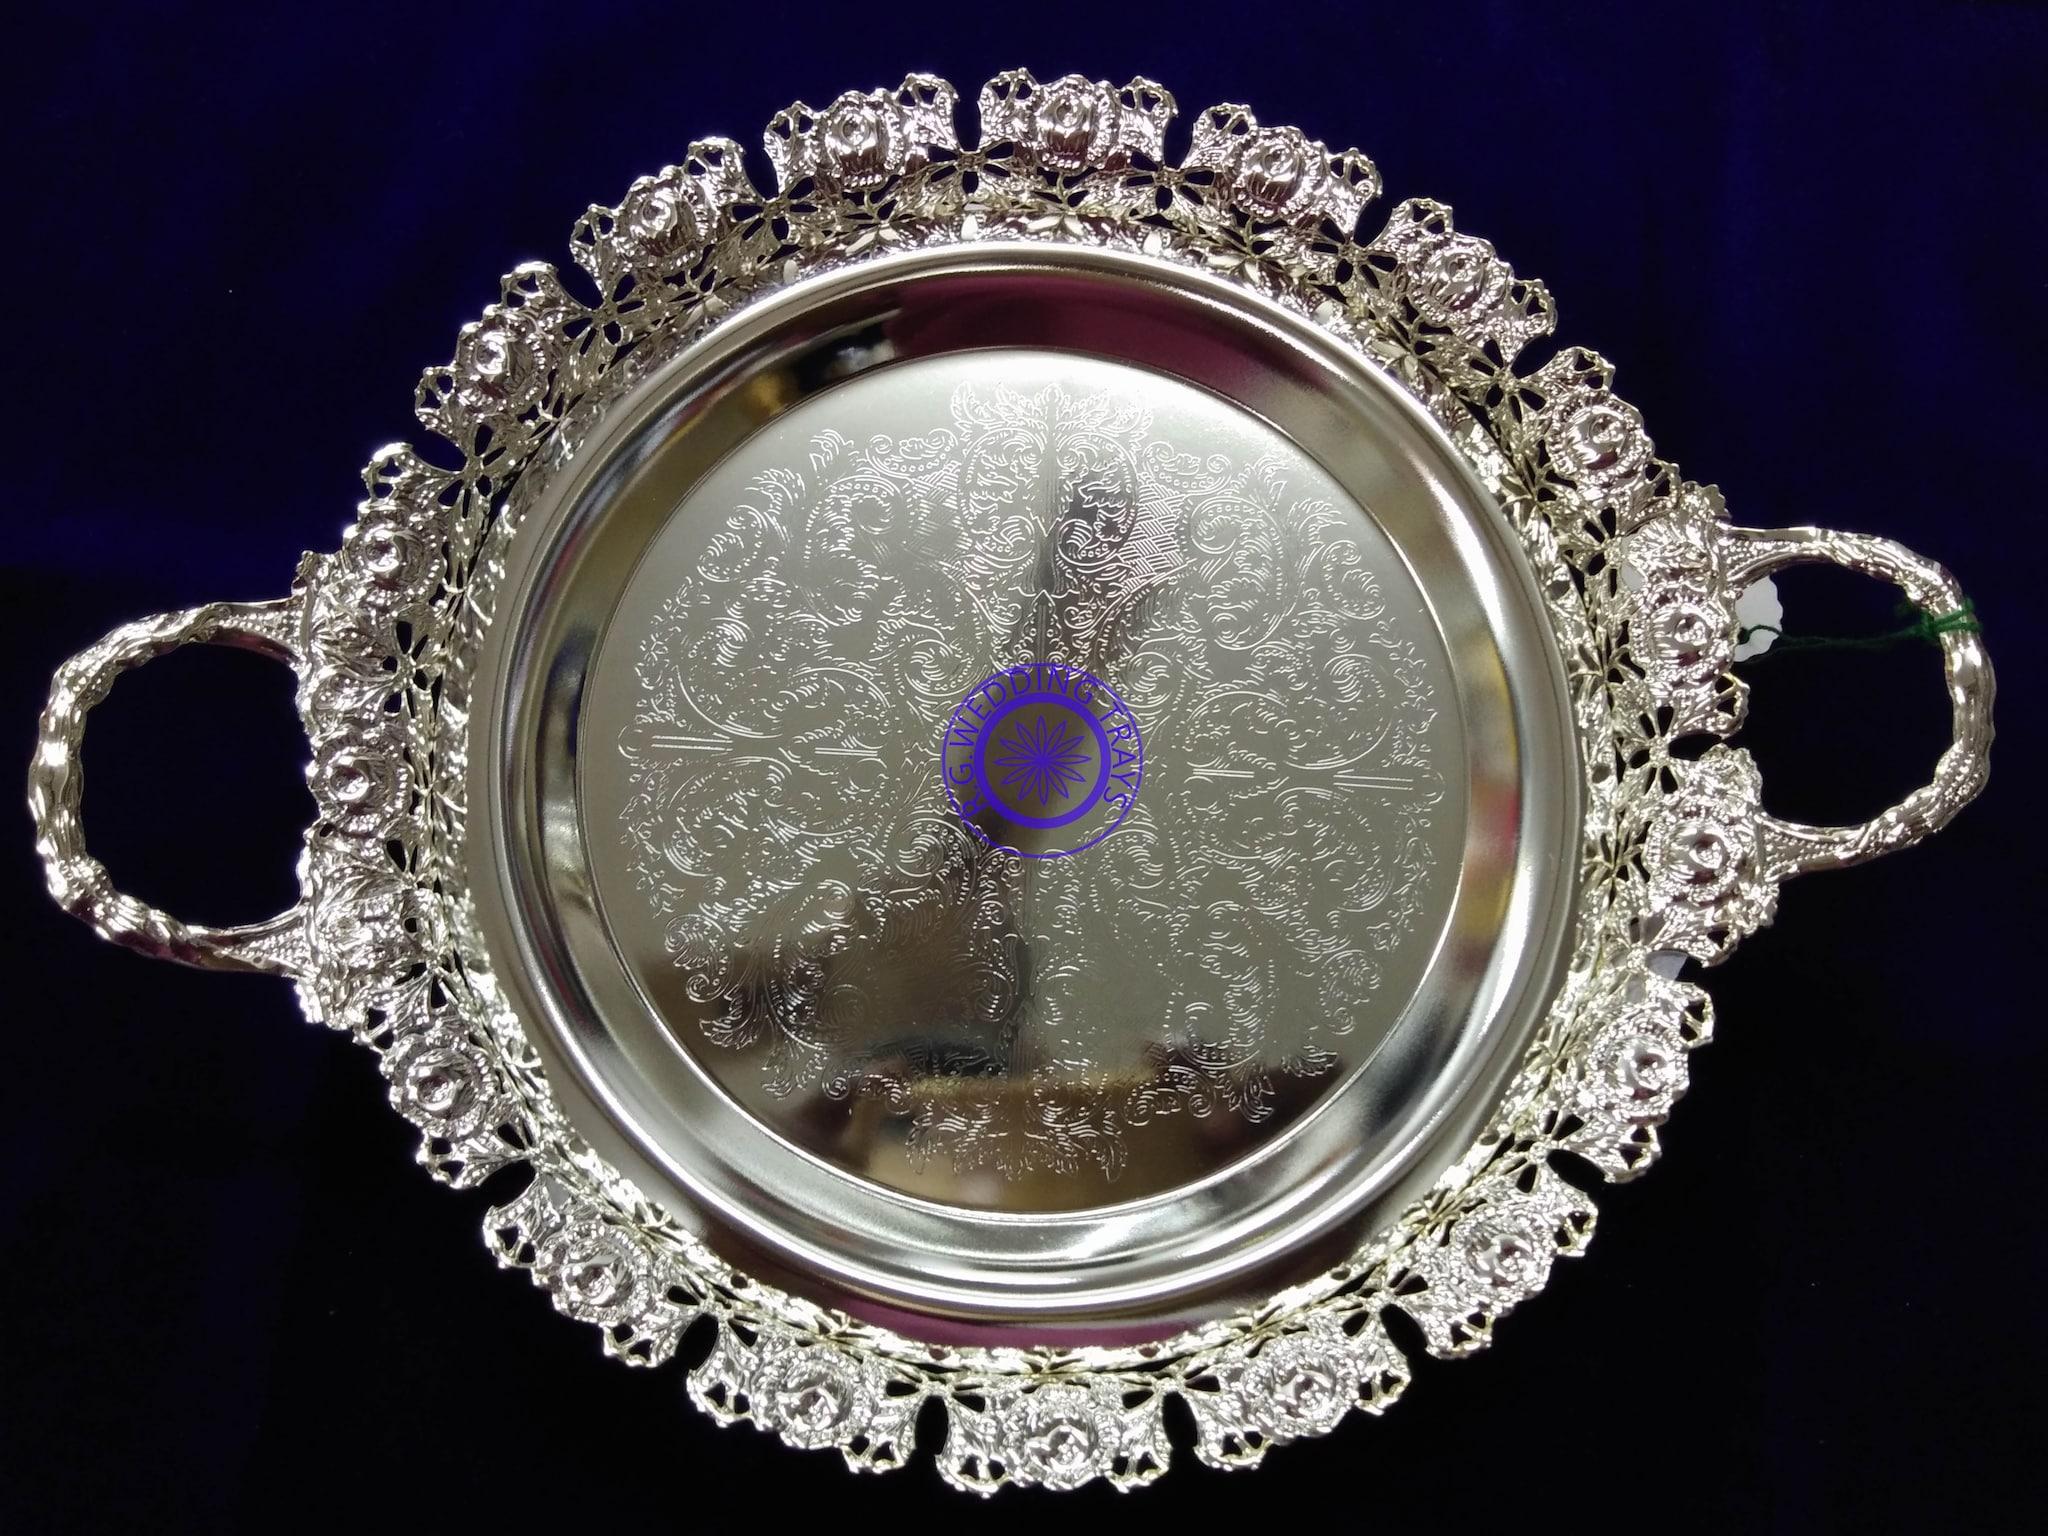 German Silver Round Tray With Handle 9 Inch German Silver Serving Tray Rg Wedding Trays Fancy Peelamedu Coimbatore Tamil Nadu